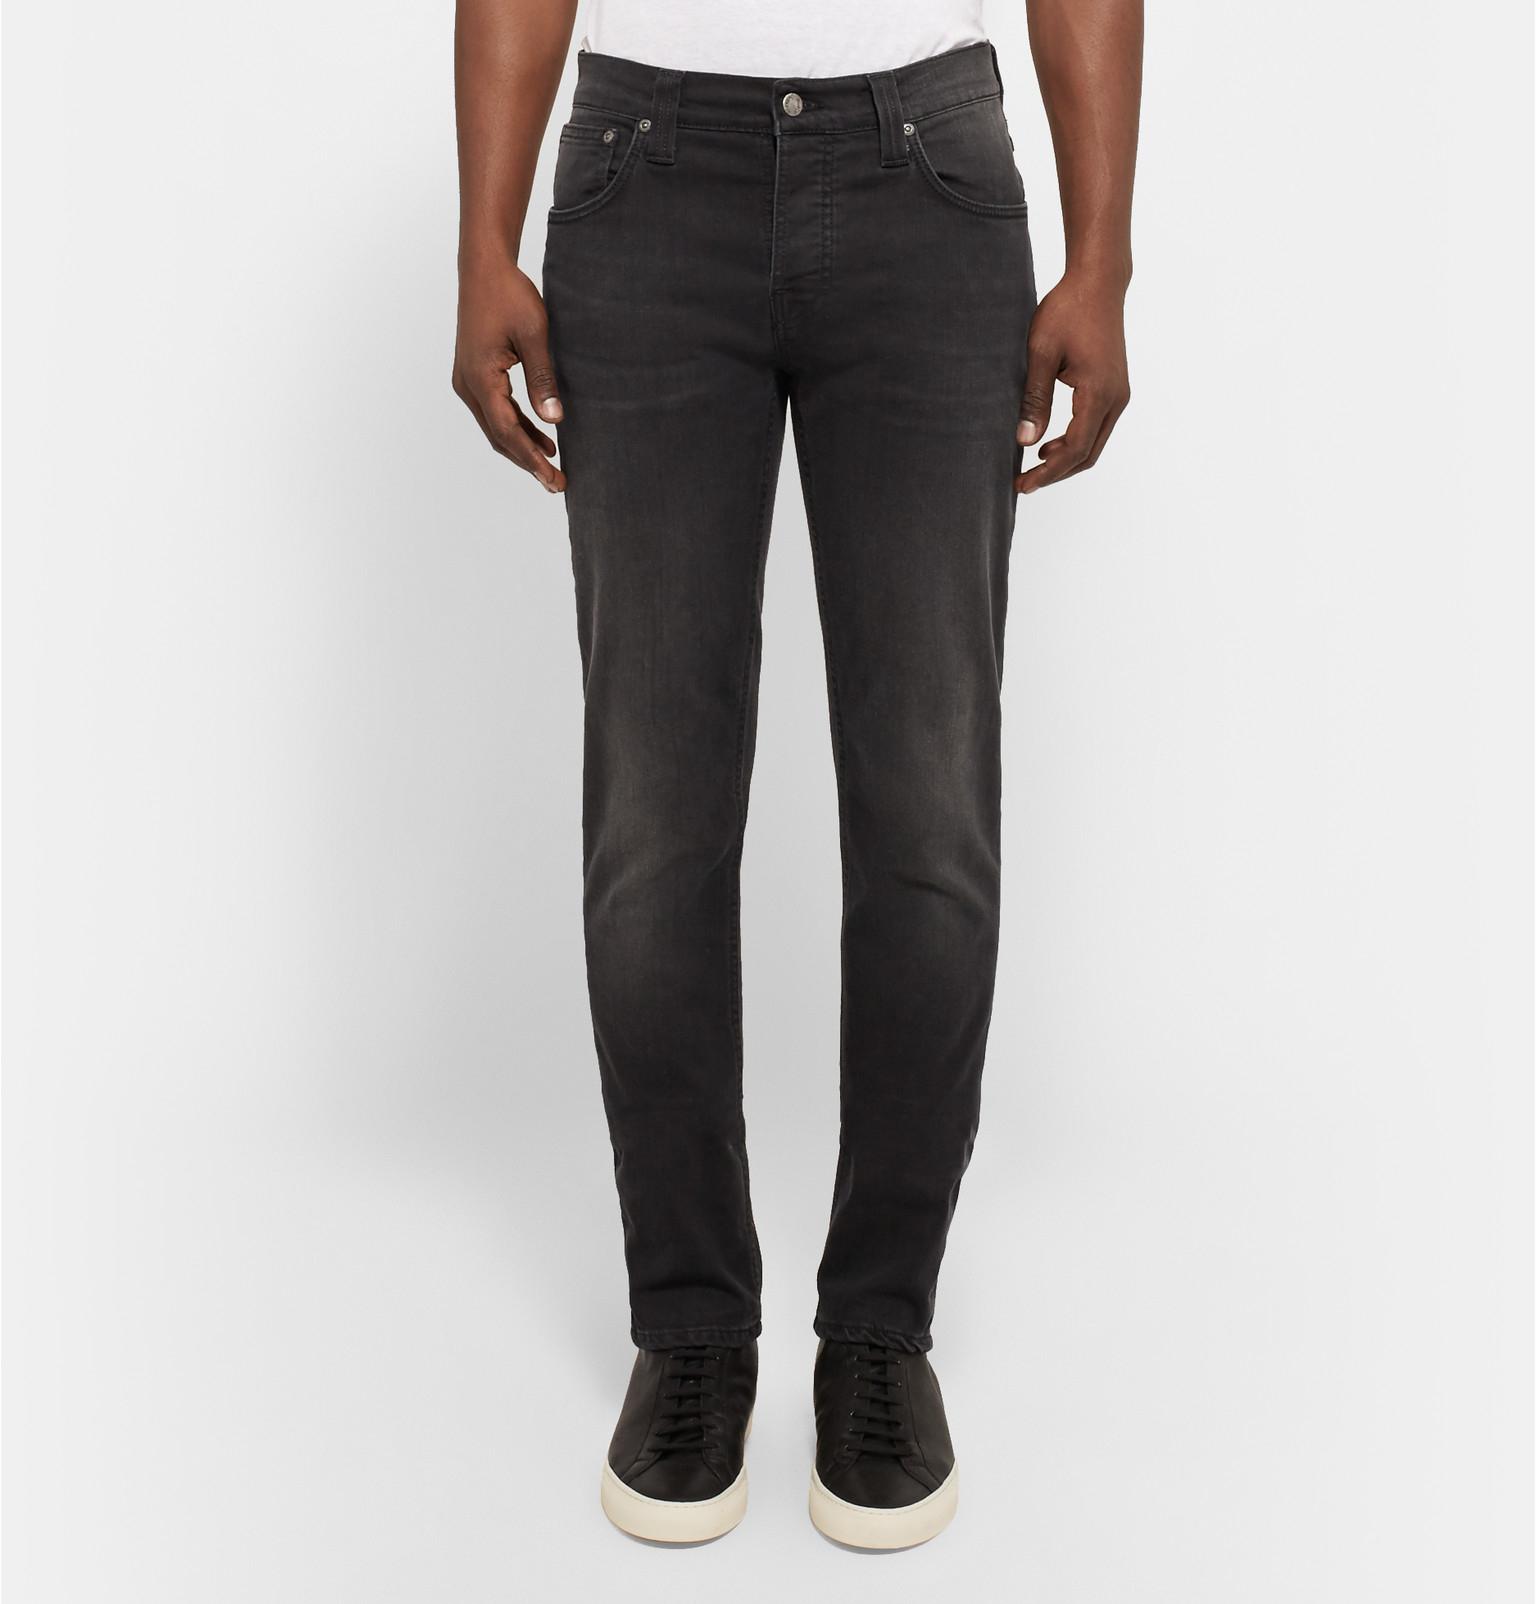 Nudie Jeans Grim Tim Washed Organic Denim Jeans in Black for Men